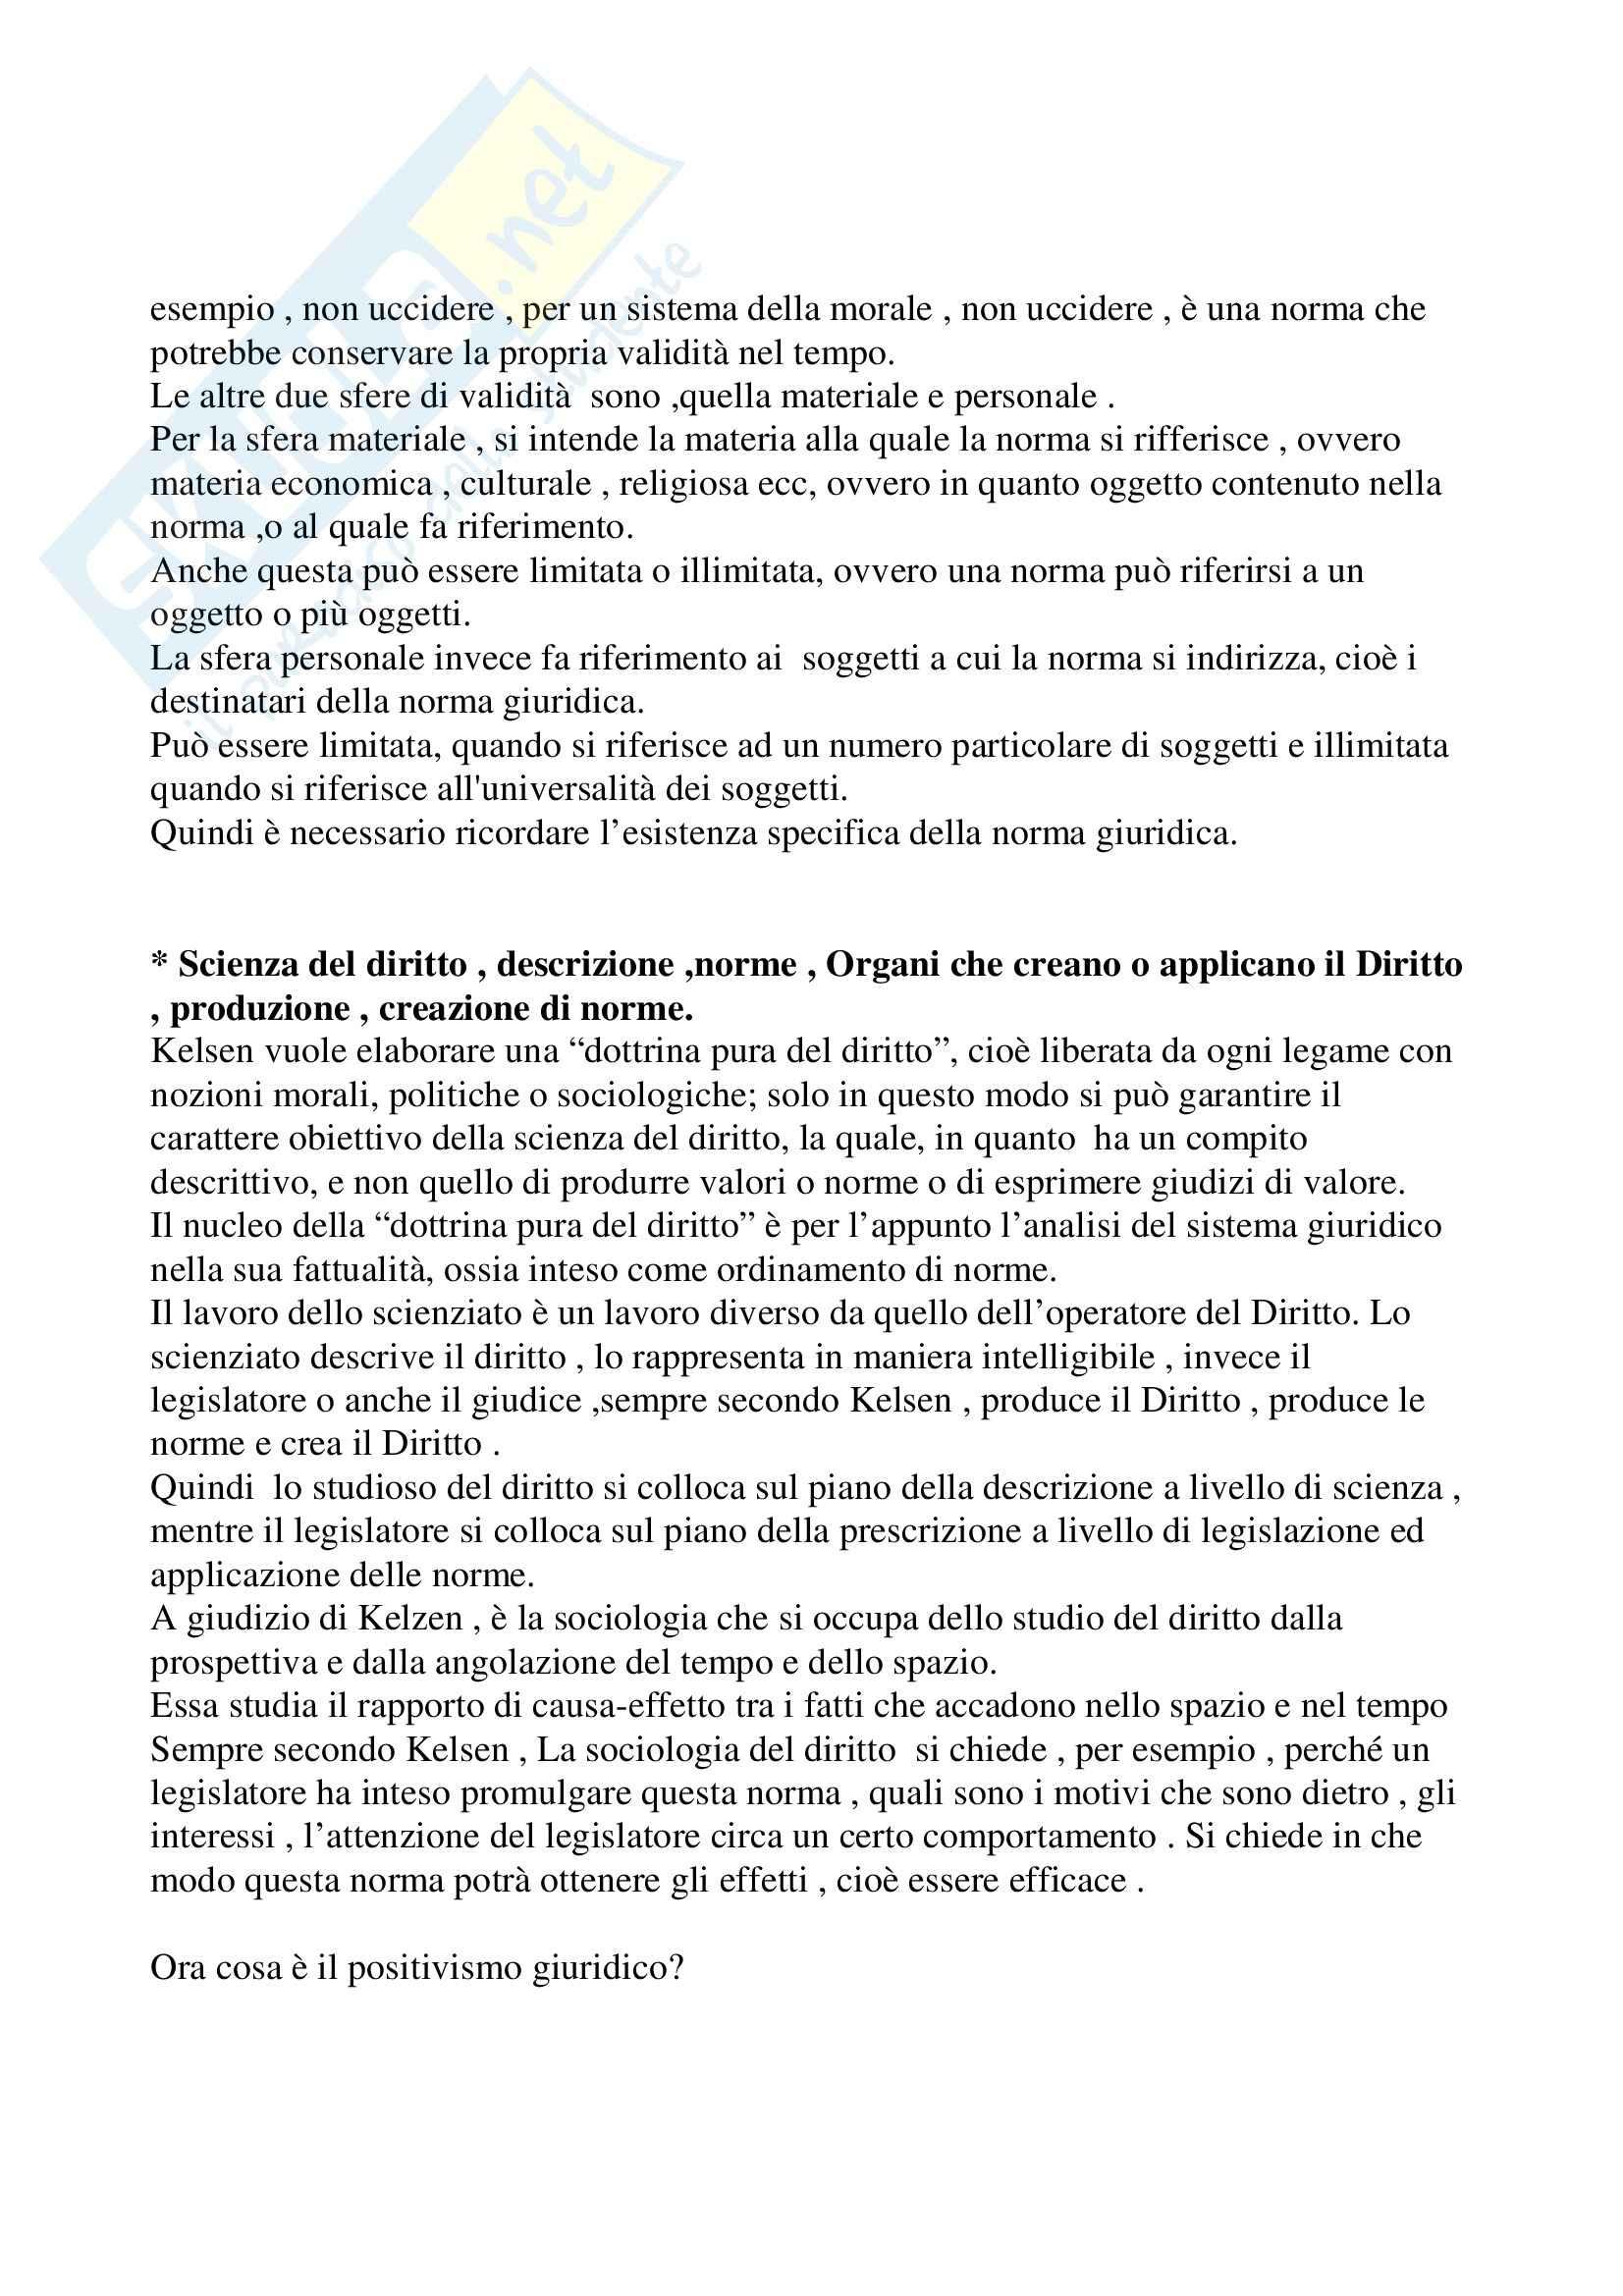 Filosofia del diritto - Kelsen Pag. 2